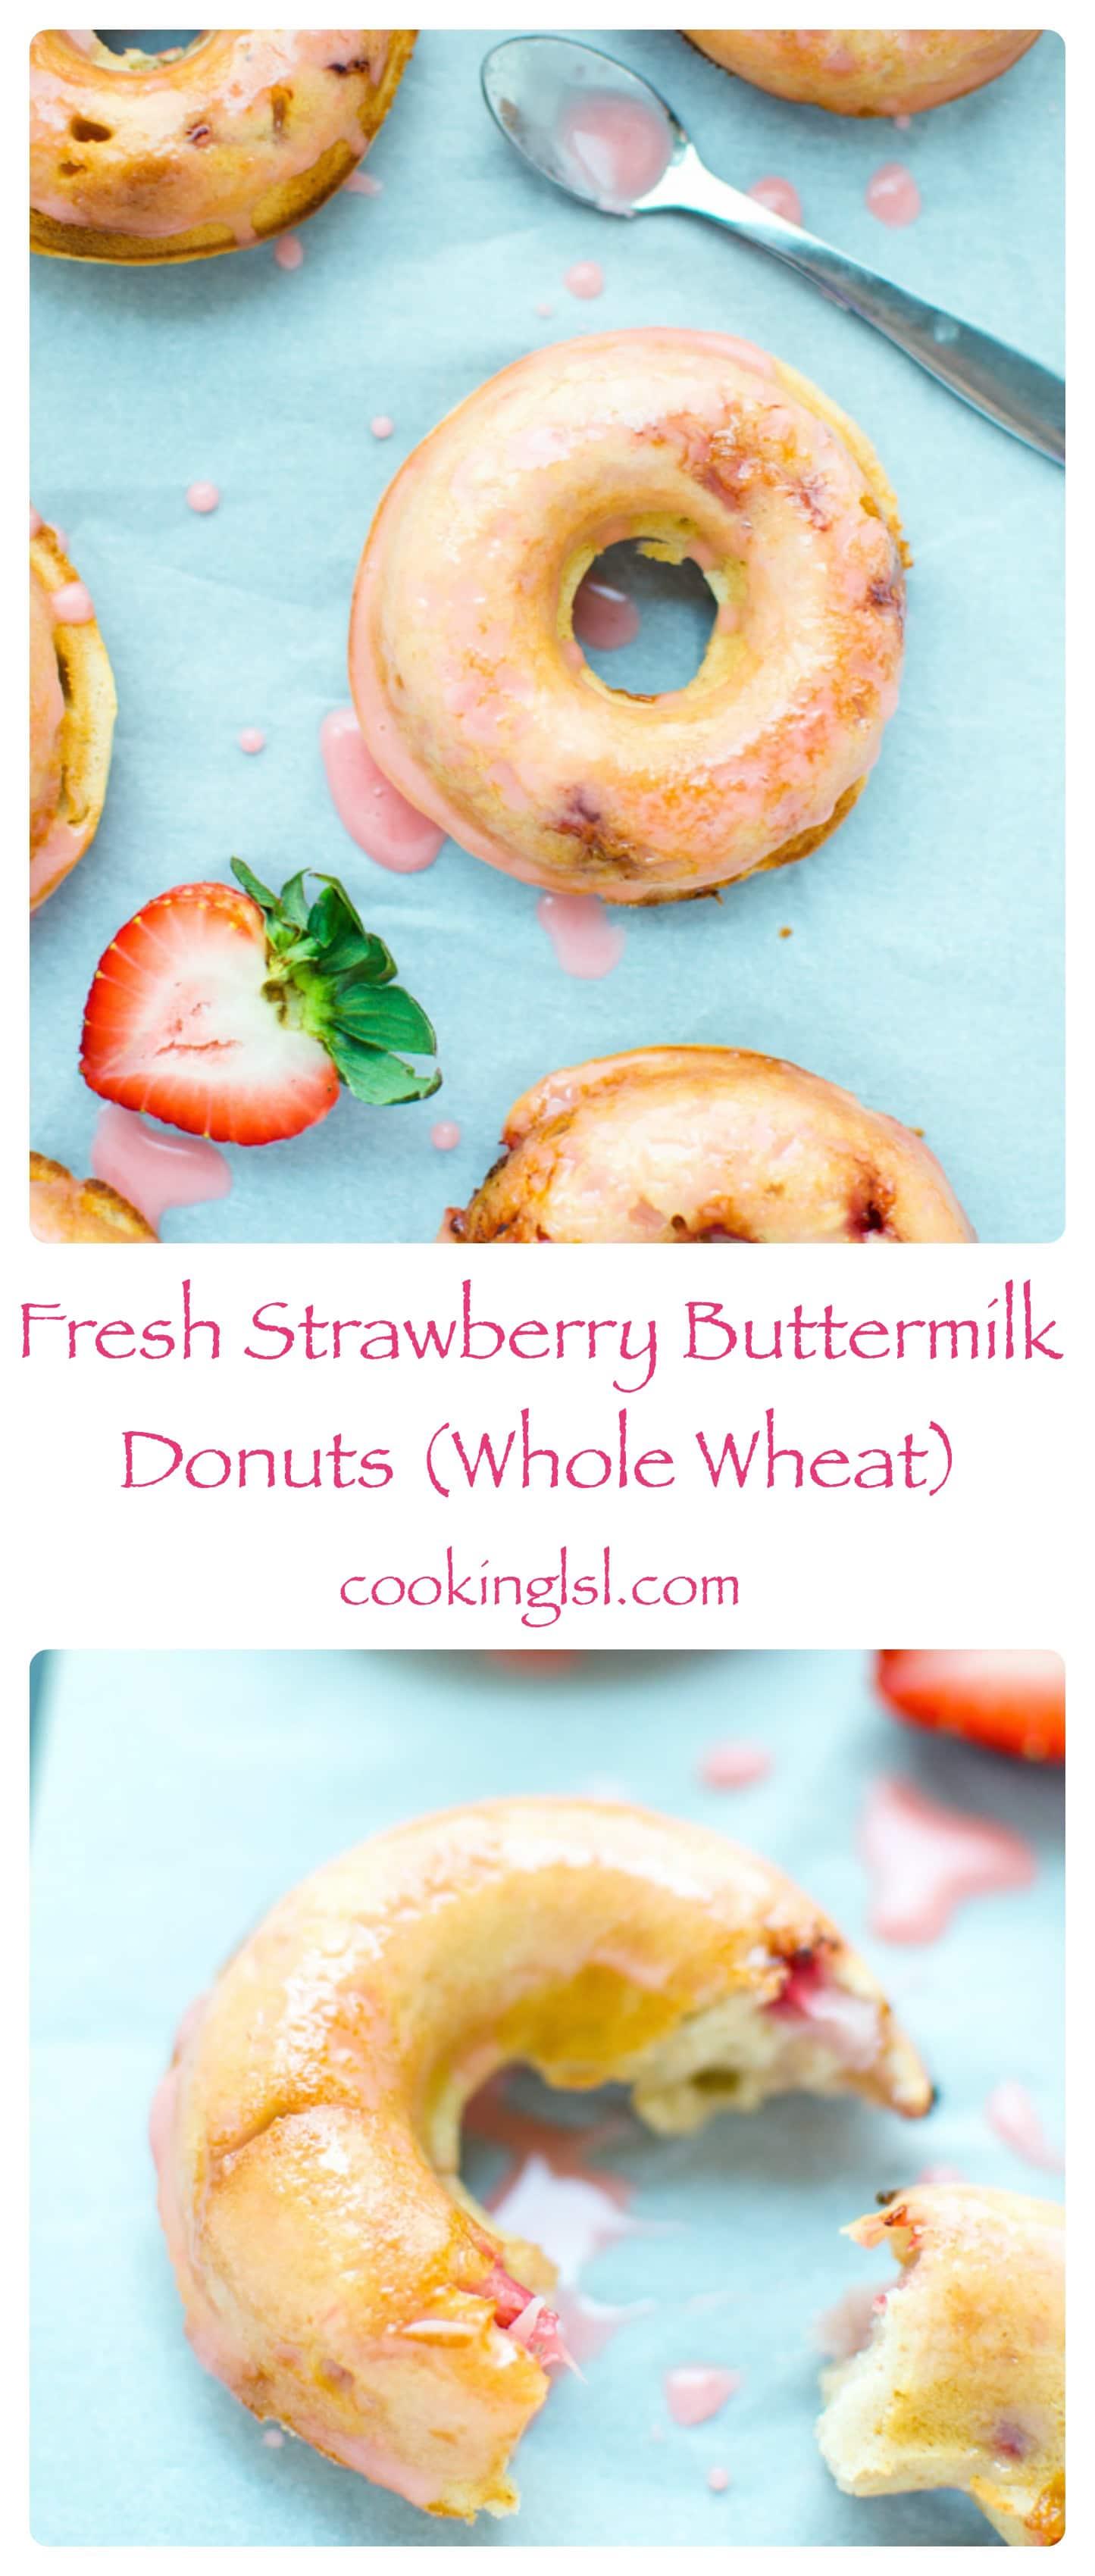 Strawberry-Buttermilk-Donuts